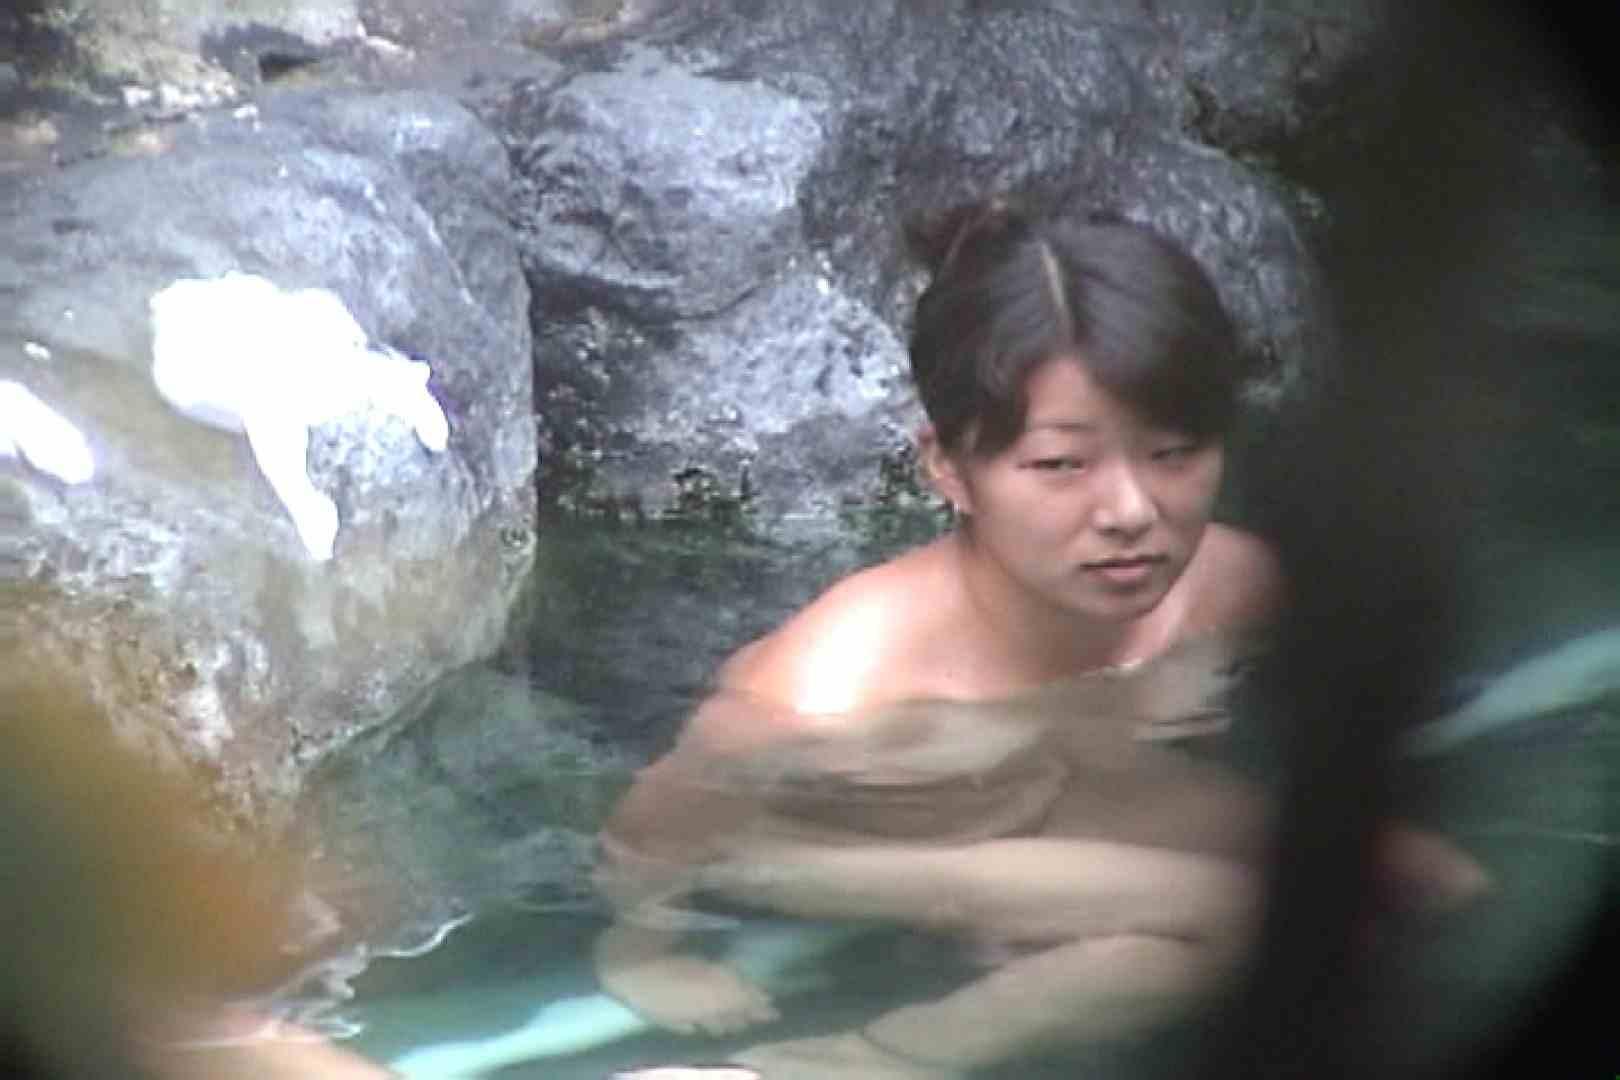 Aquaな露天風呂Vol.69【VIP限定】 盗撮 アダルト動画キャプチャ 106連発 101